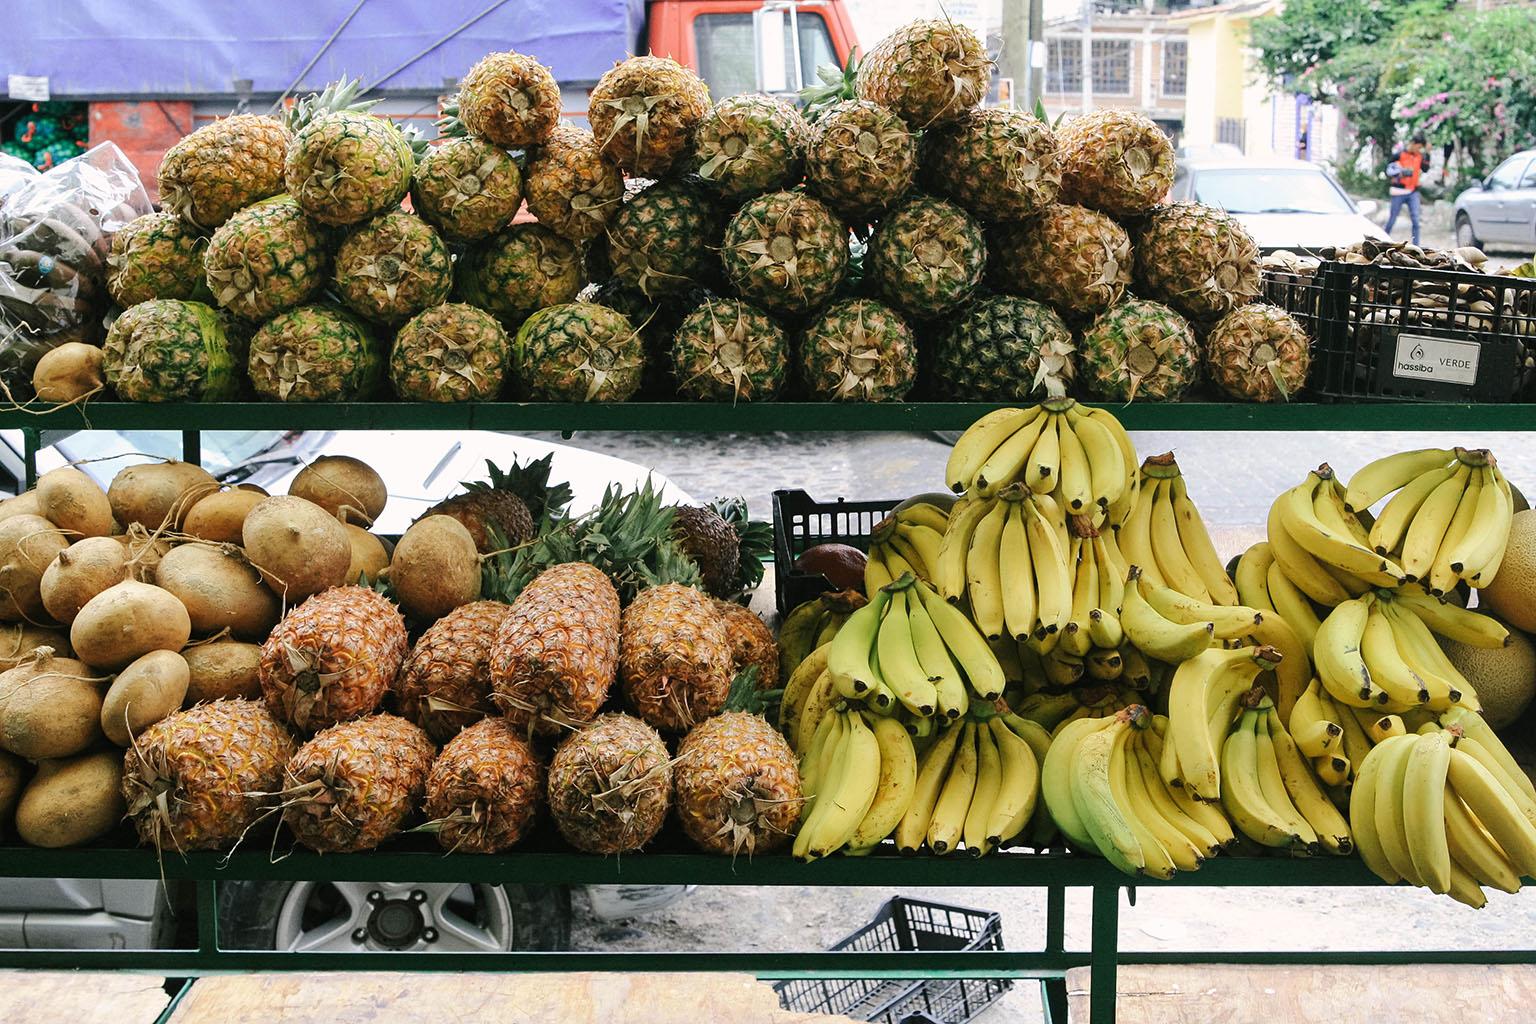 Cost of food in Puerto Vallarta